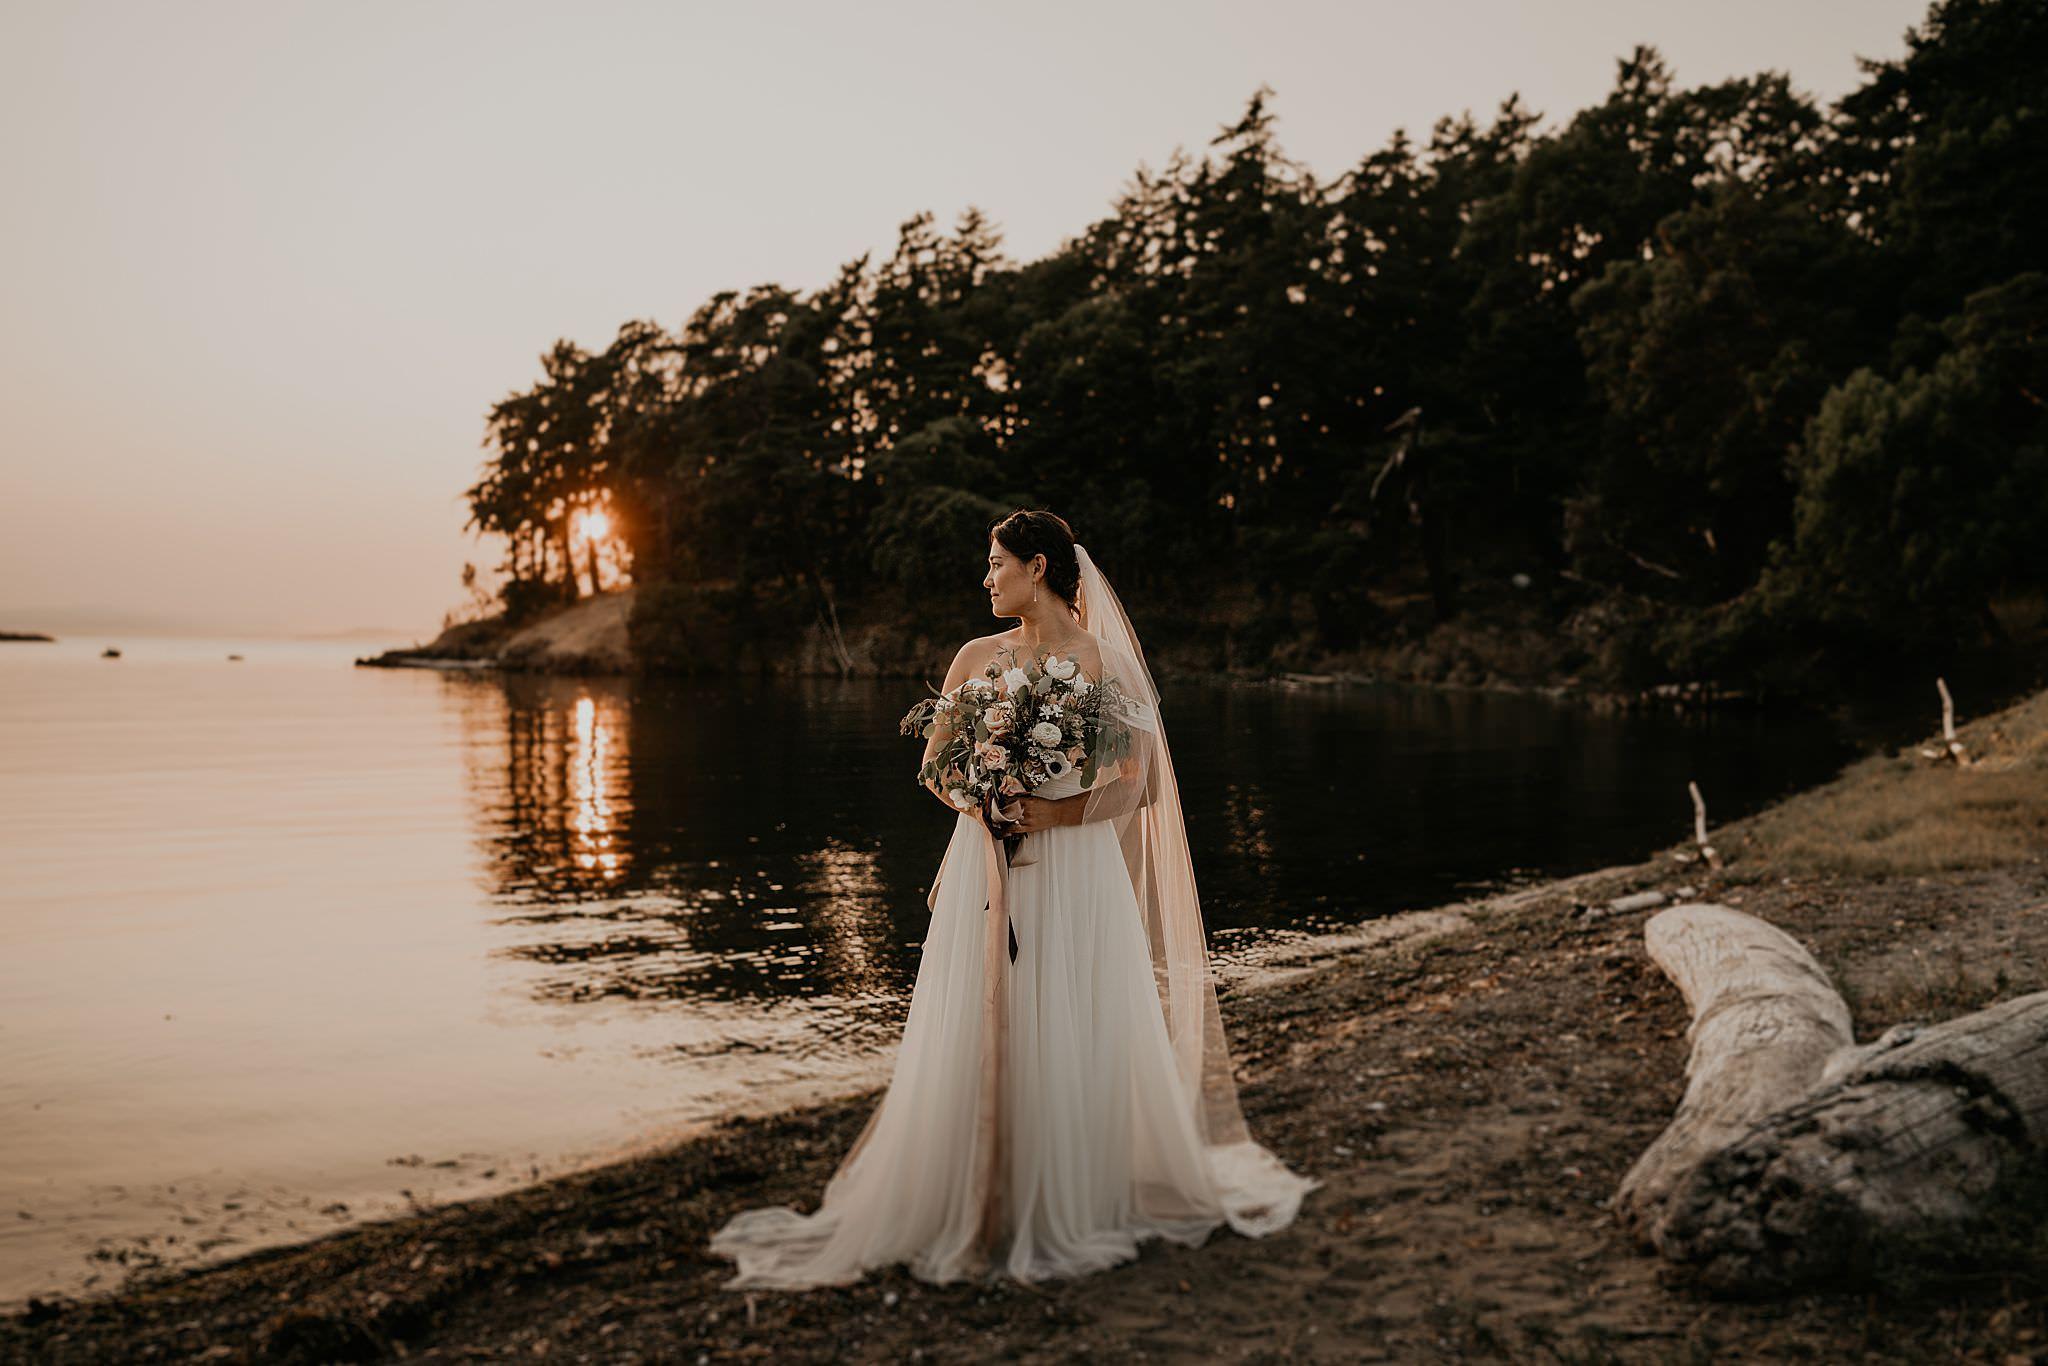 God is a woman wedding dress fairy tale Roche Harbor wedding photographer